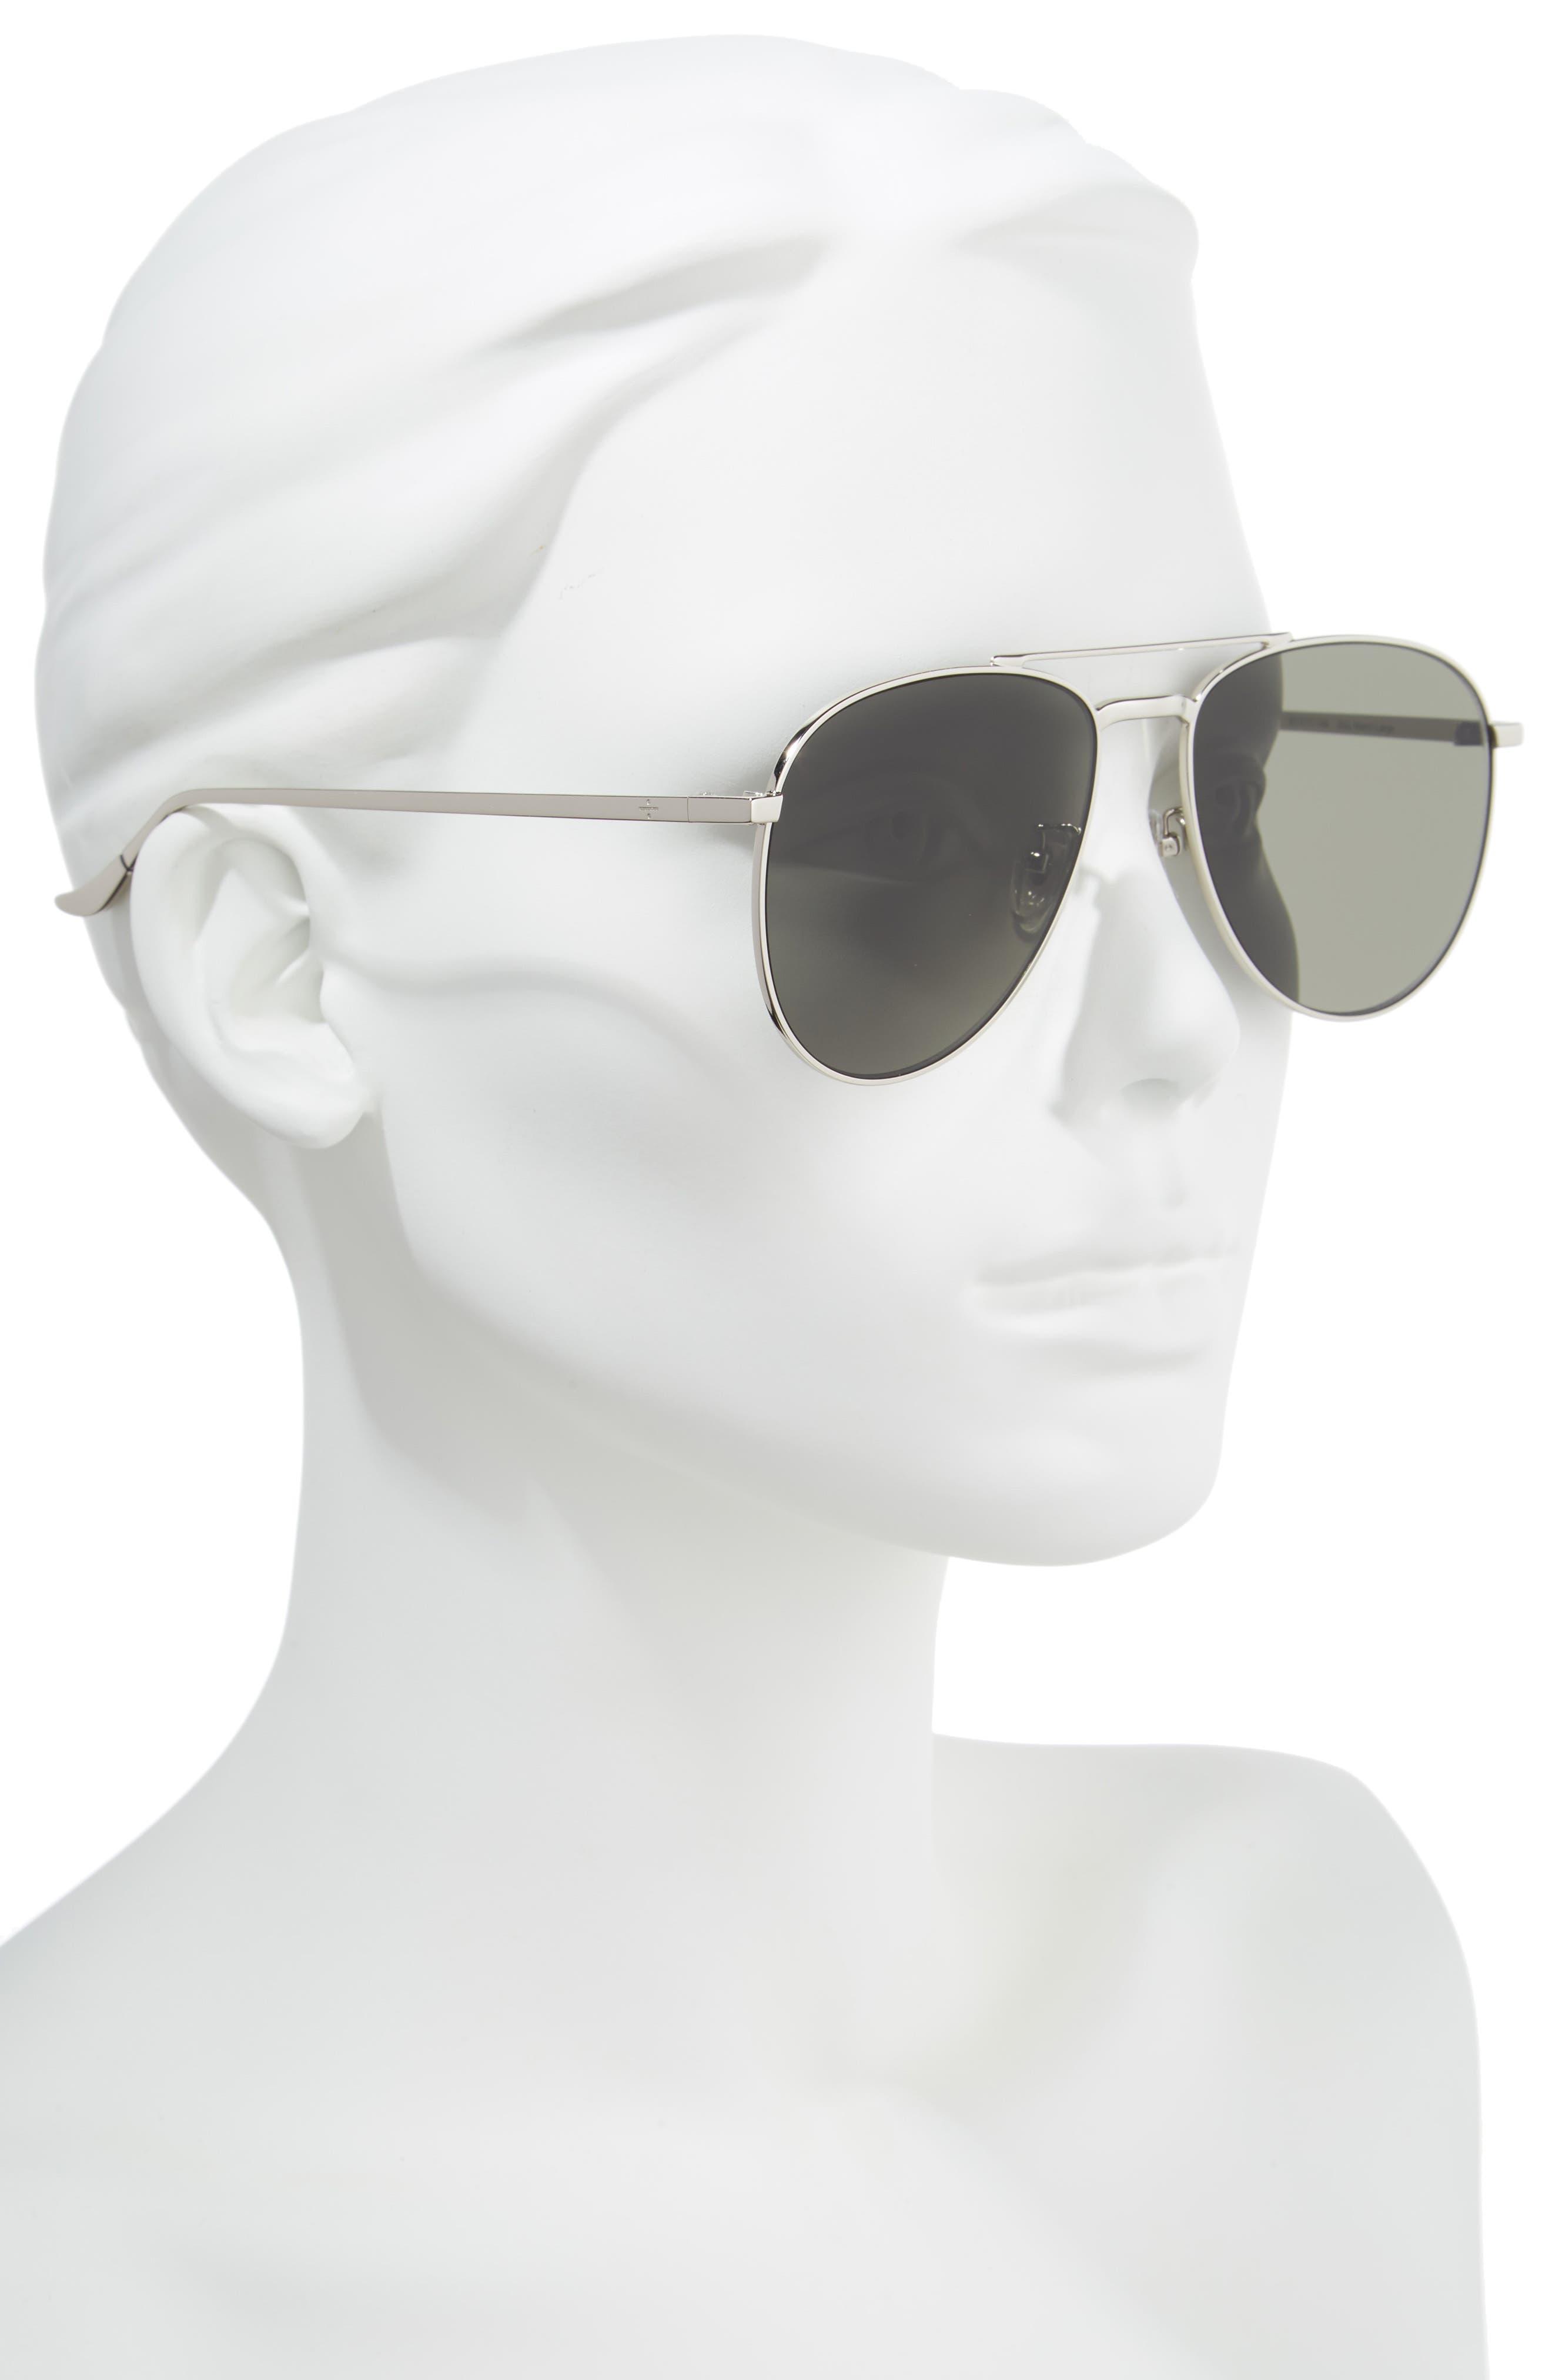 BLANC & ECLARE Miami 61mm Large Polarized Aviator Sunglasses,                             Alternate thumbnail 2, color,                             040